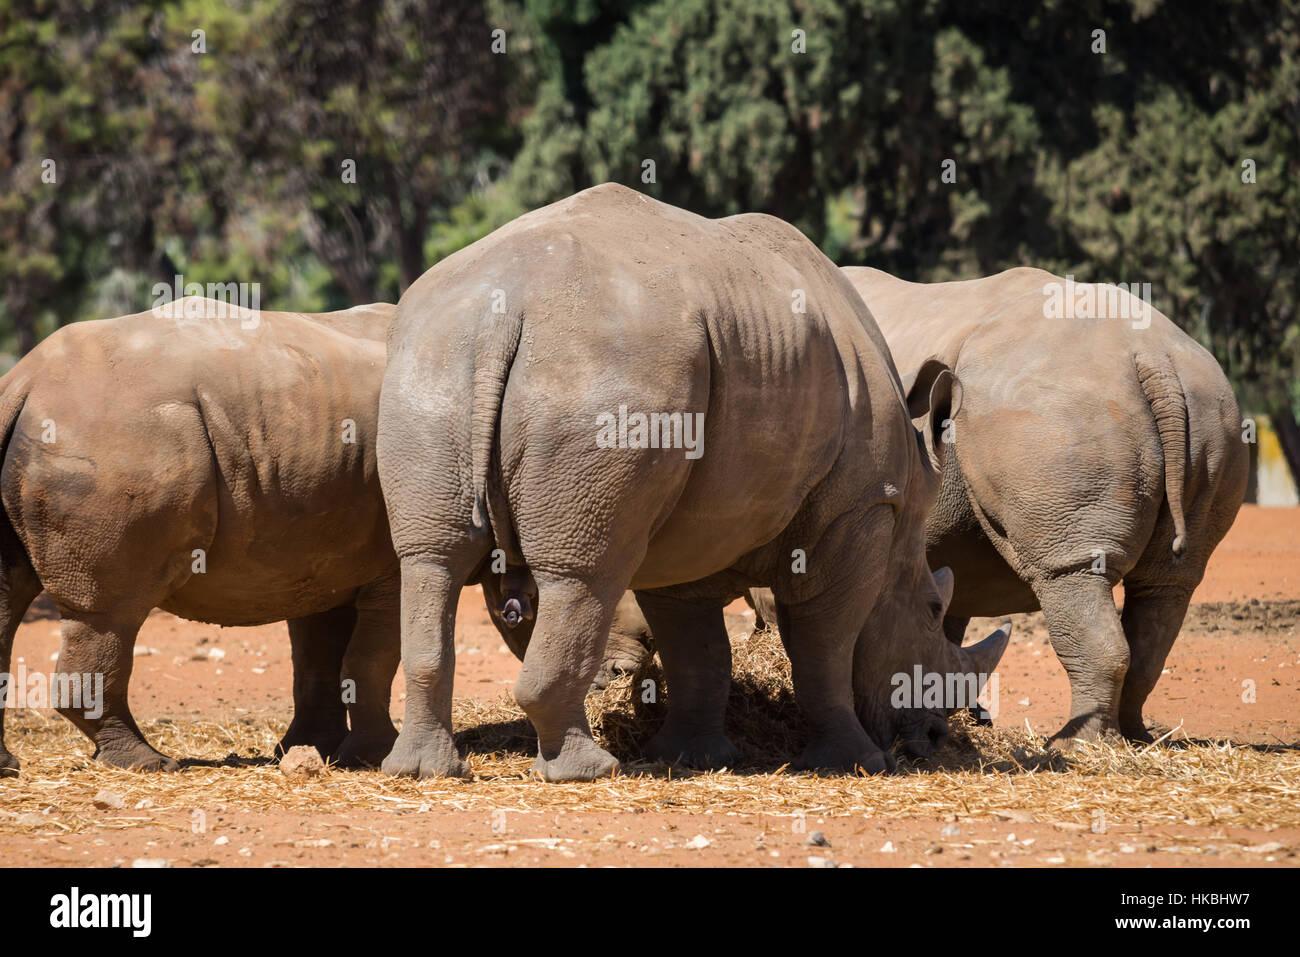 Visit to Safari Ramat Gan, Israel - Stock Image